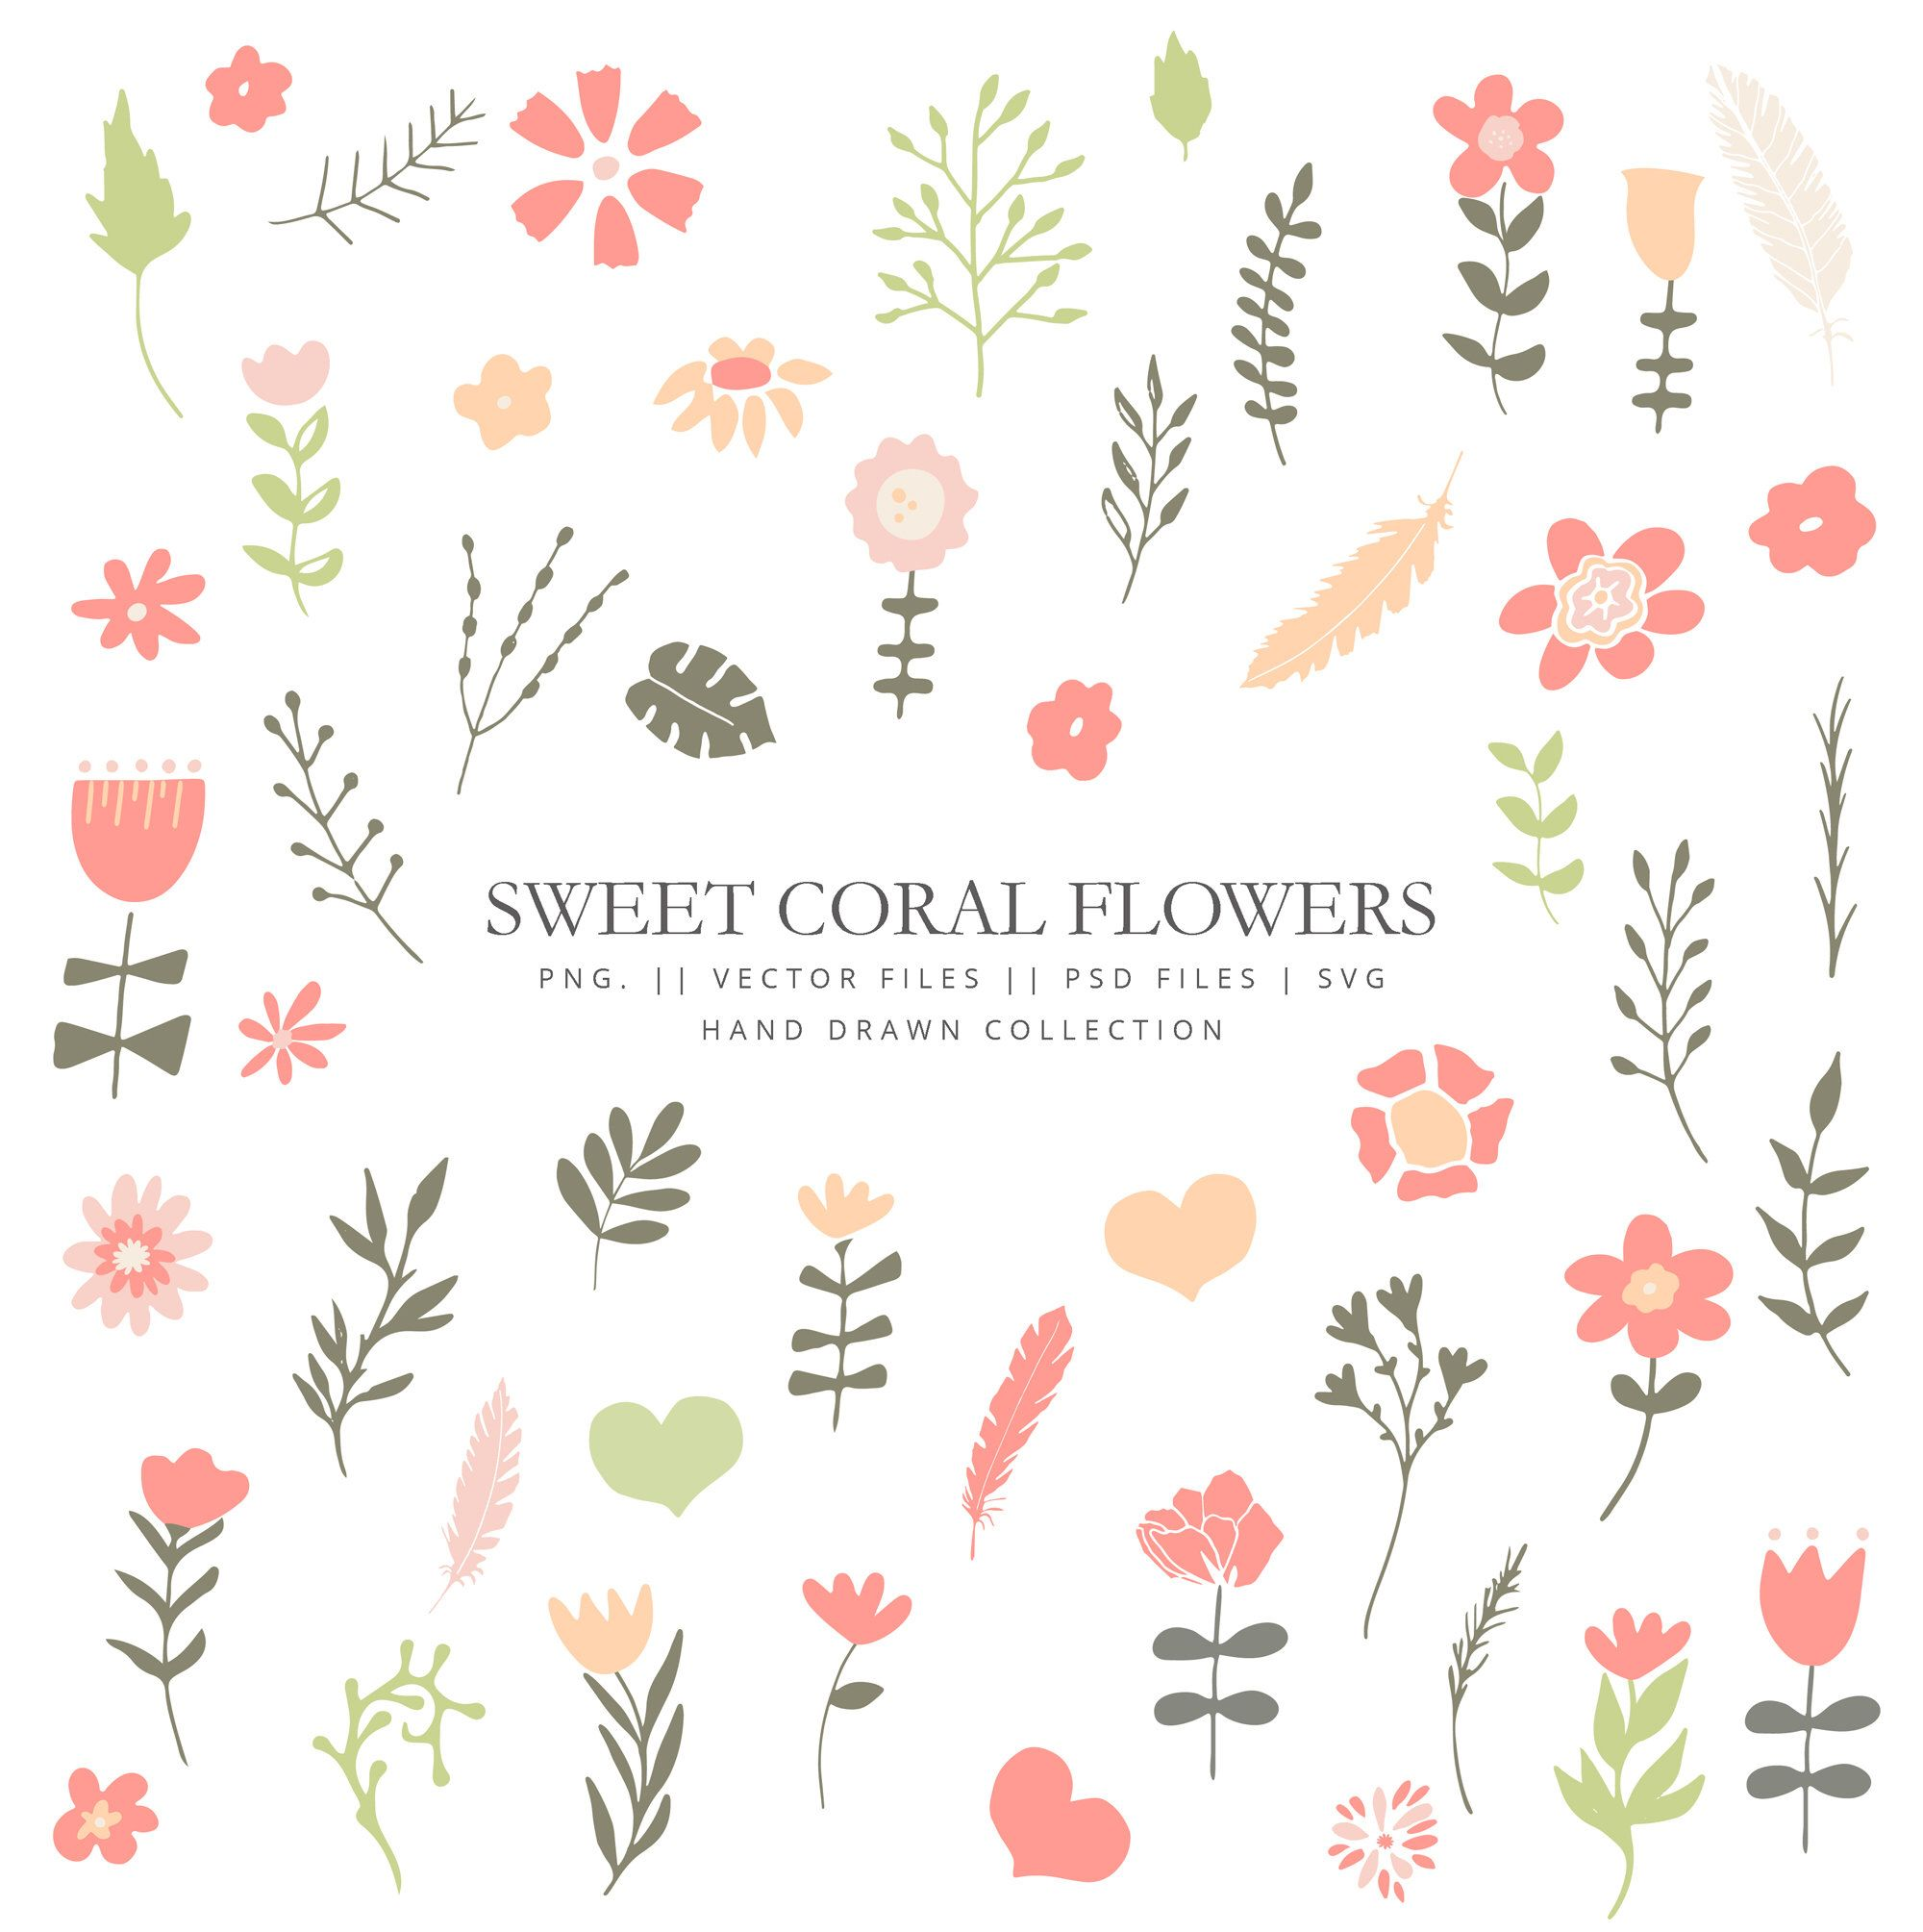 Petalos clipart banner black and white download Clipart con flores en color coral, 50 elementos florales ... banner black and white download